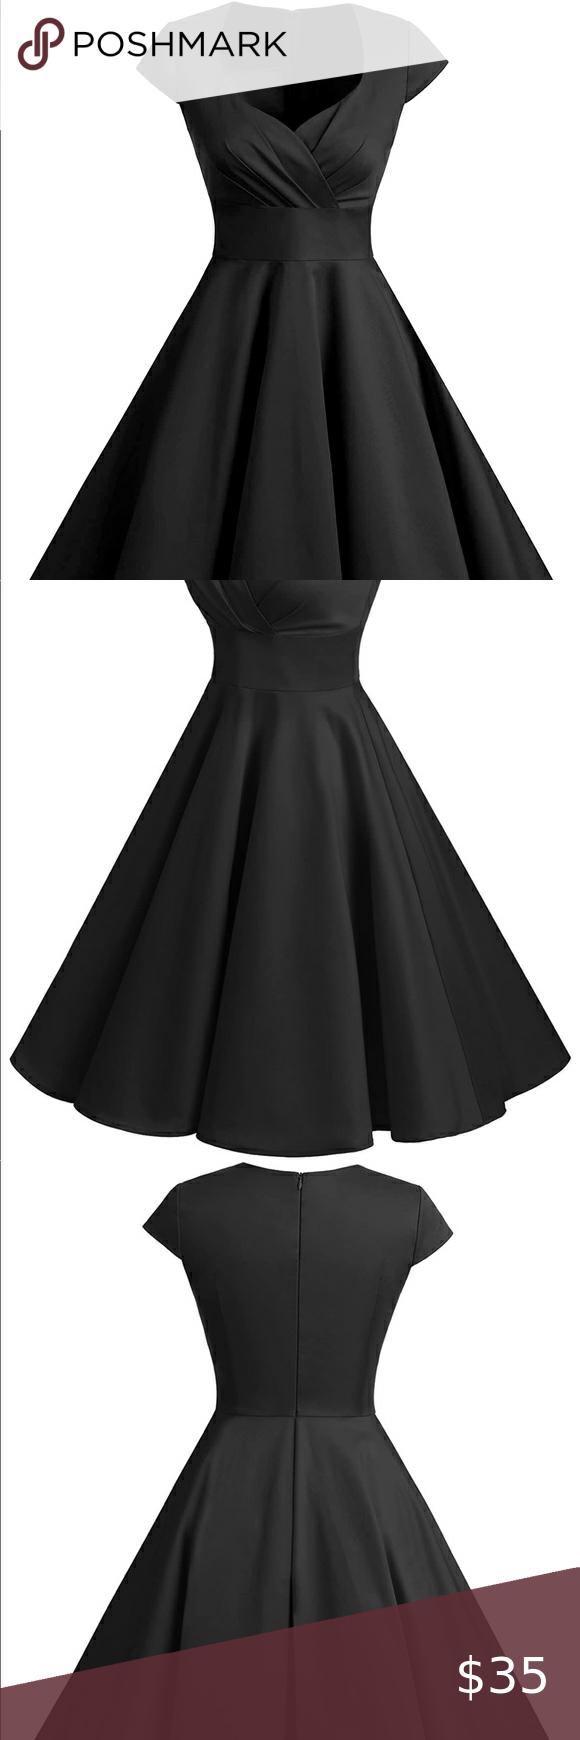 Women Short 1950s Retro Vintage Black Dress In 2020 Vintage Black Dress Black Dress Dresses [ 1740 x 580 Pixel ]